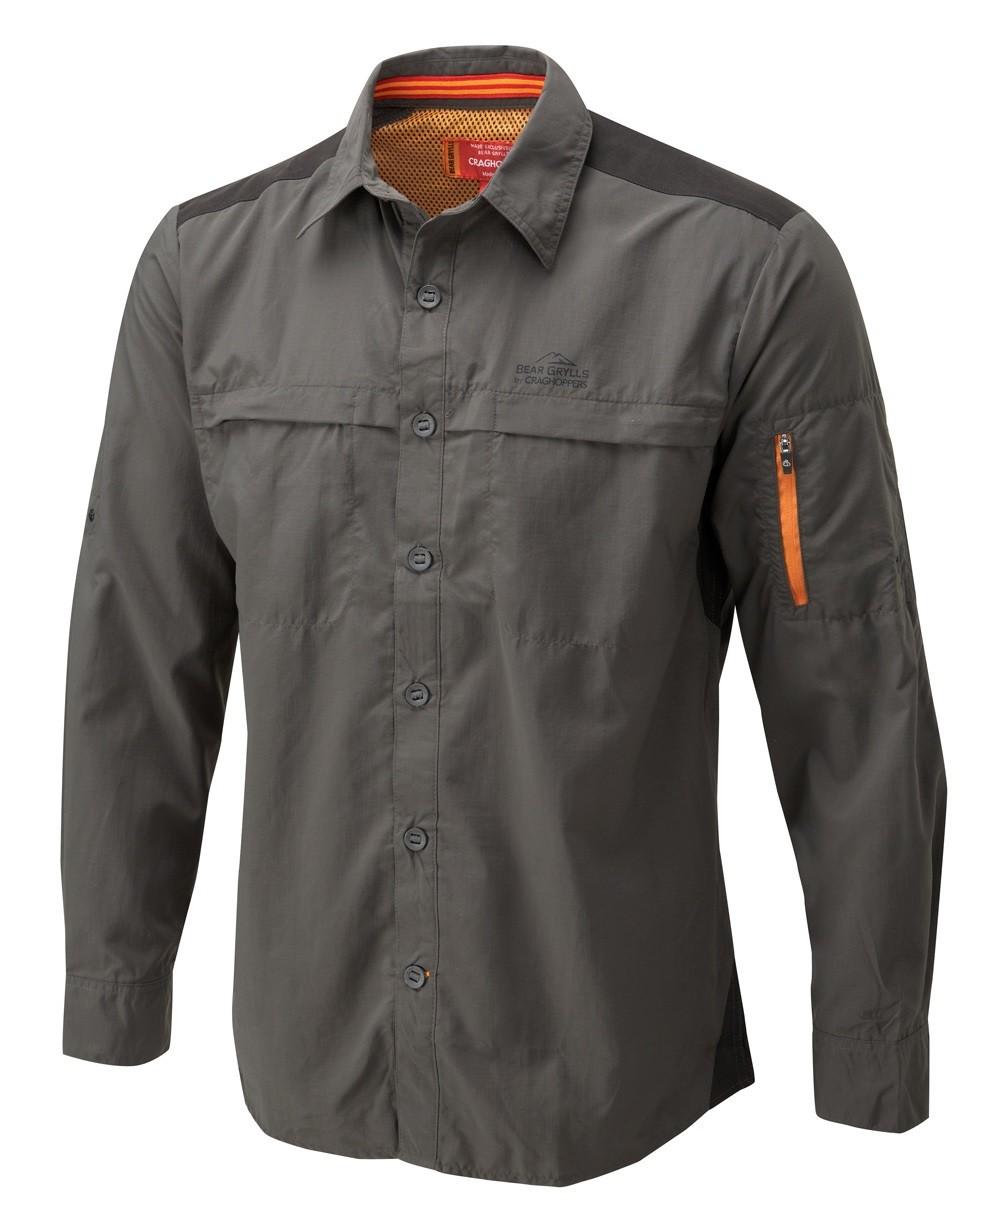 Craghoppers bear grylls trek men 39 s long sleeve shirt from for Mens outdoor long sleeve shirts